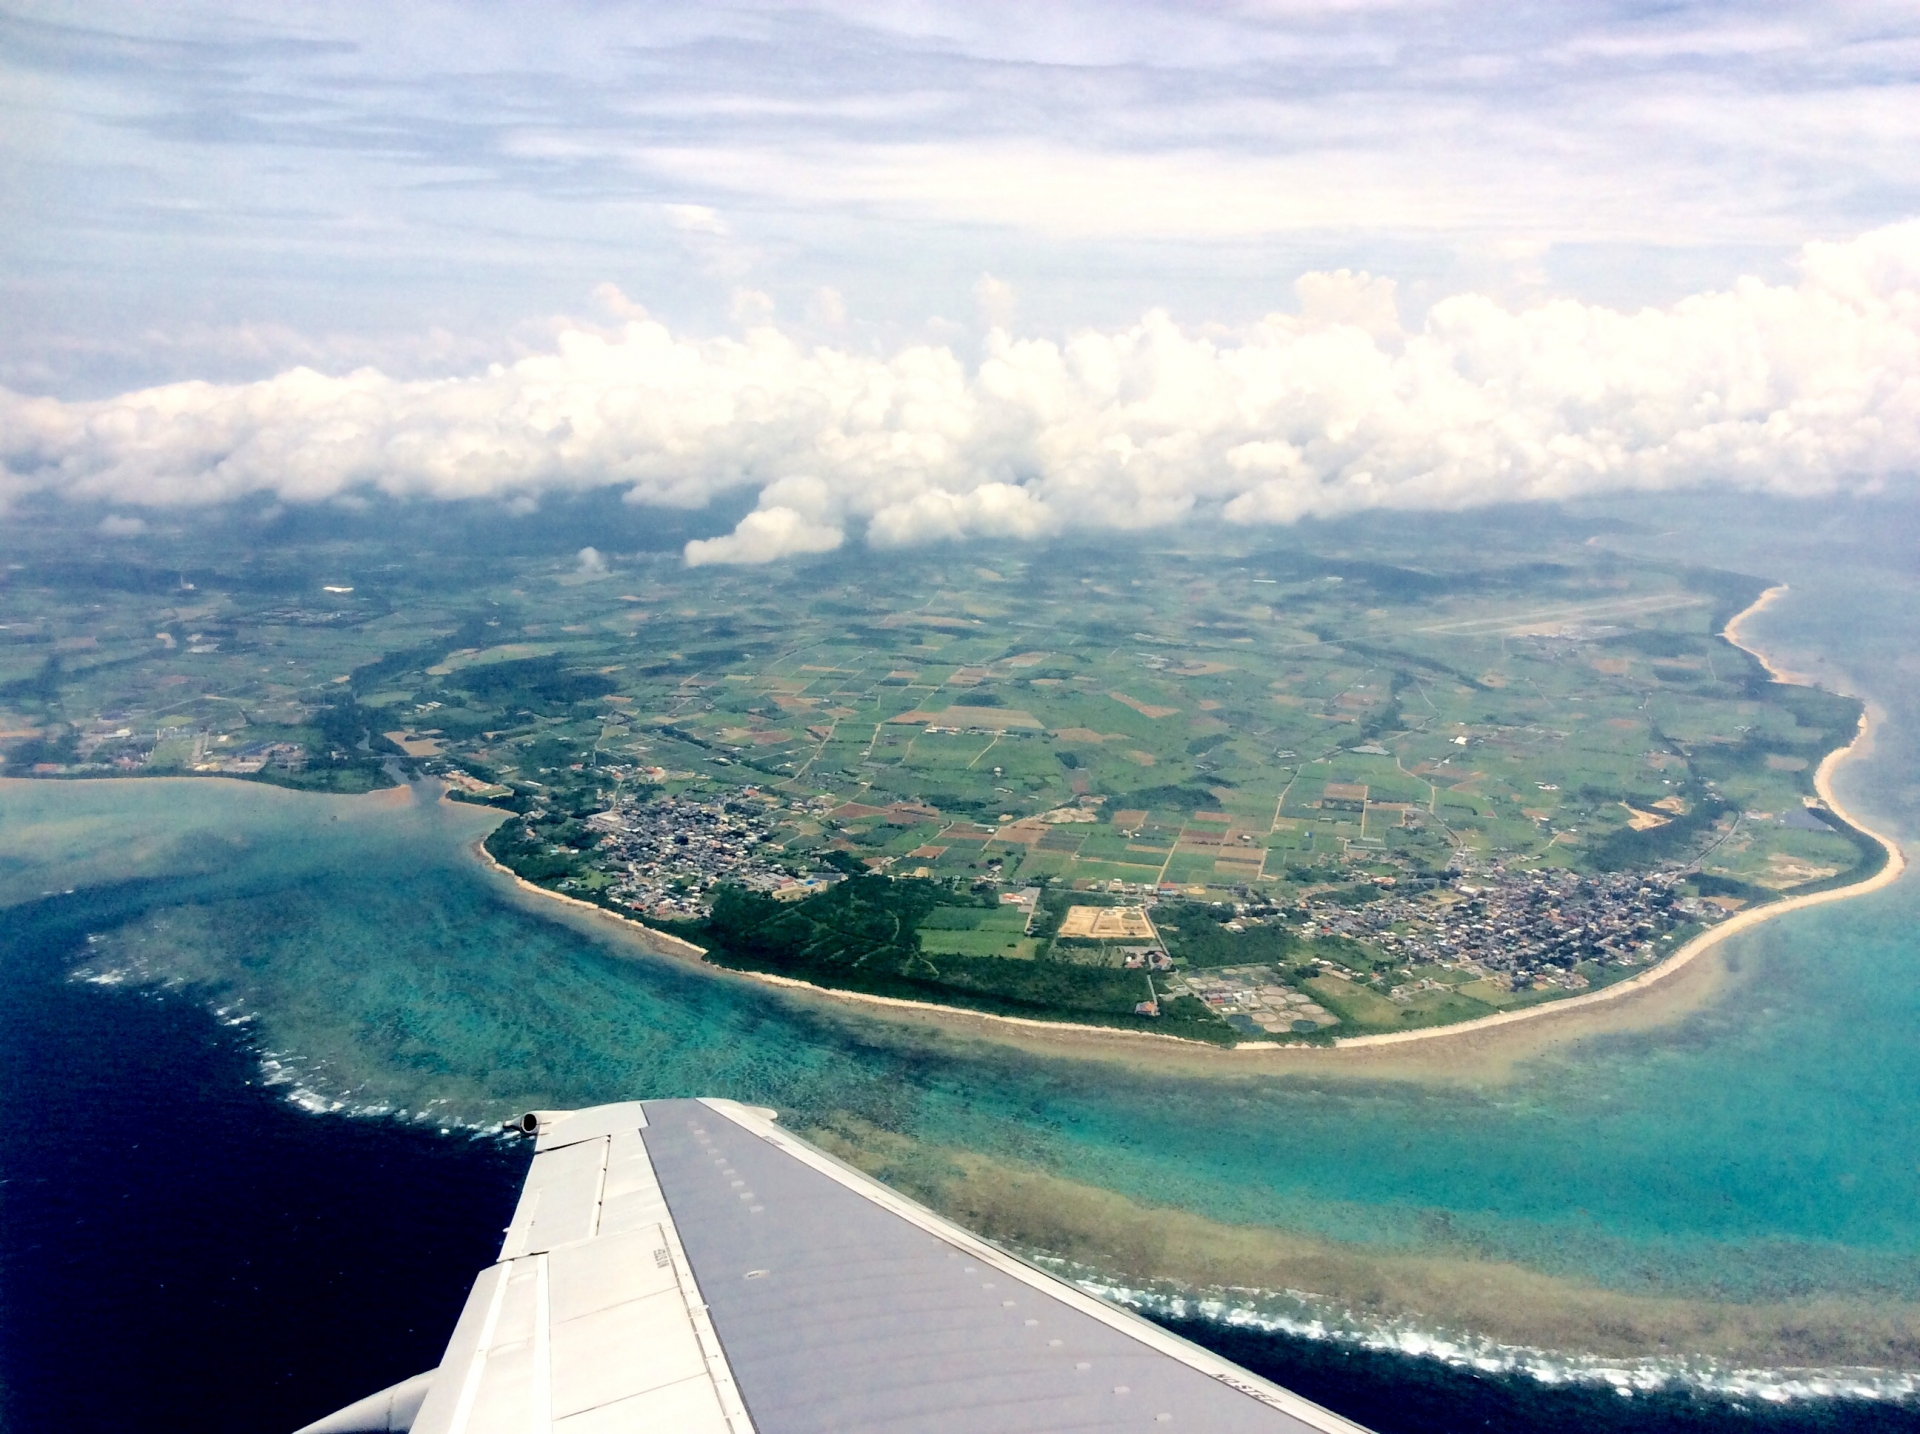 石垣島上空の写真